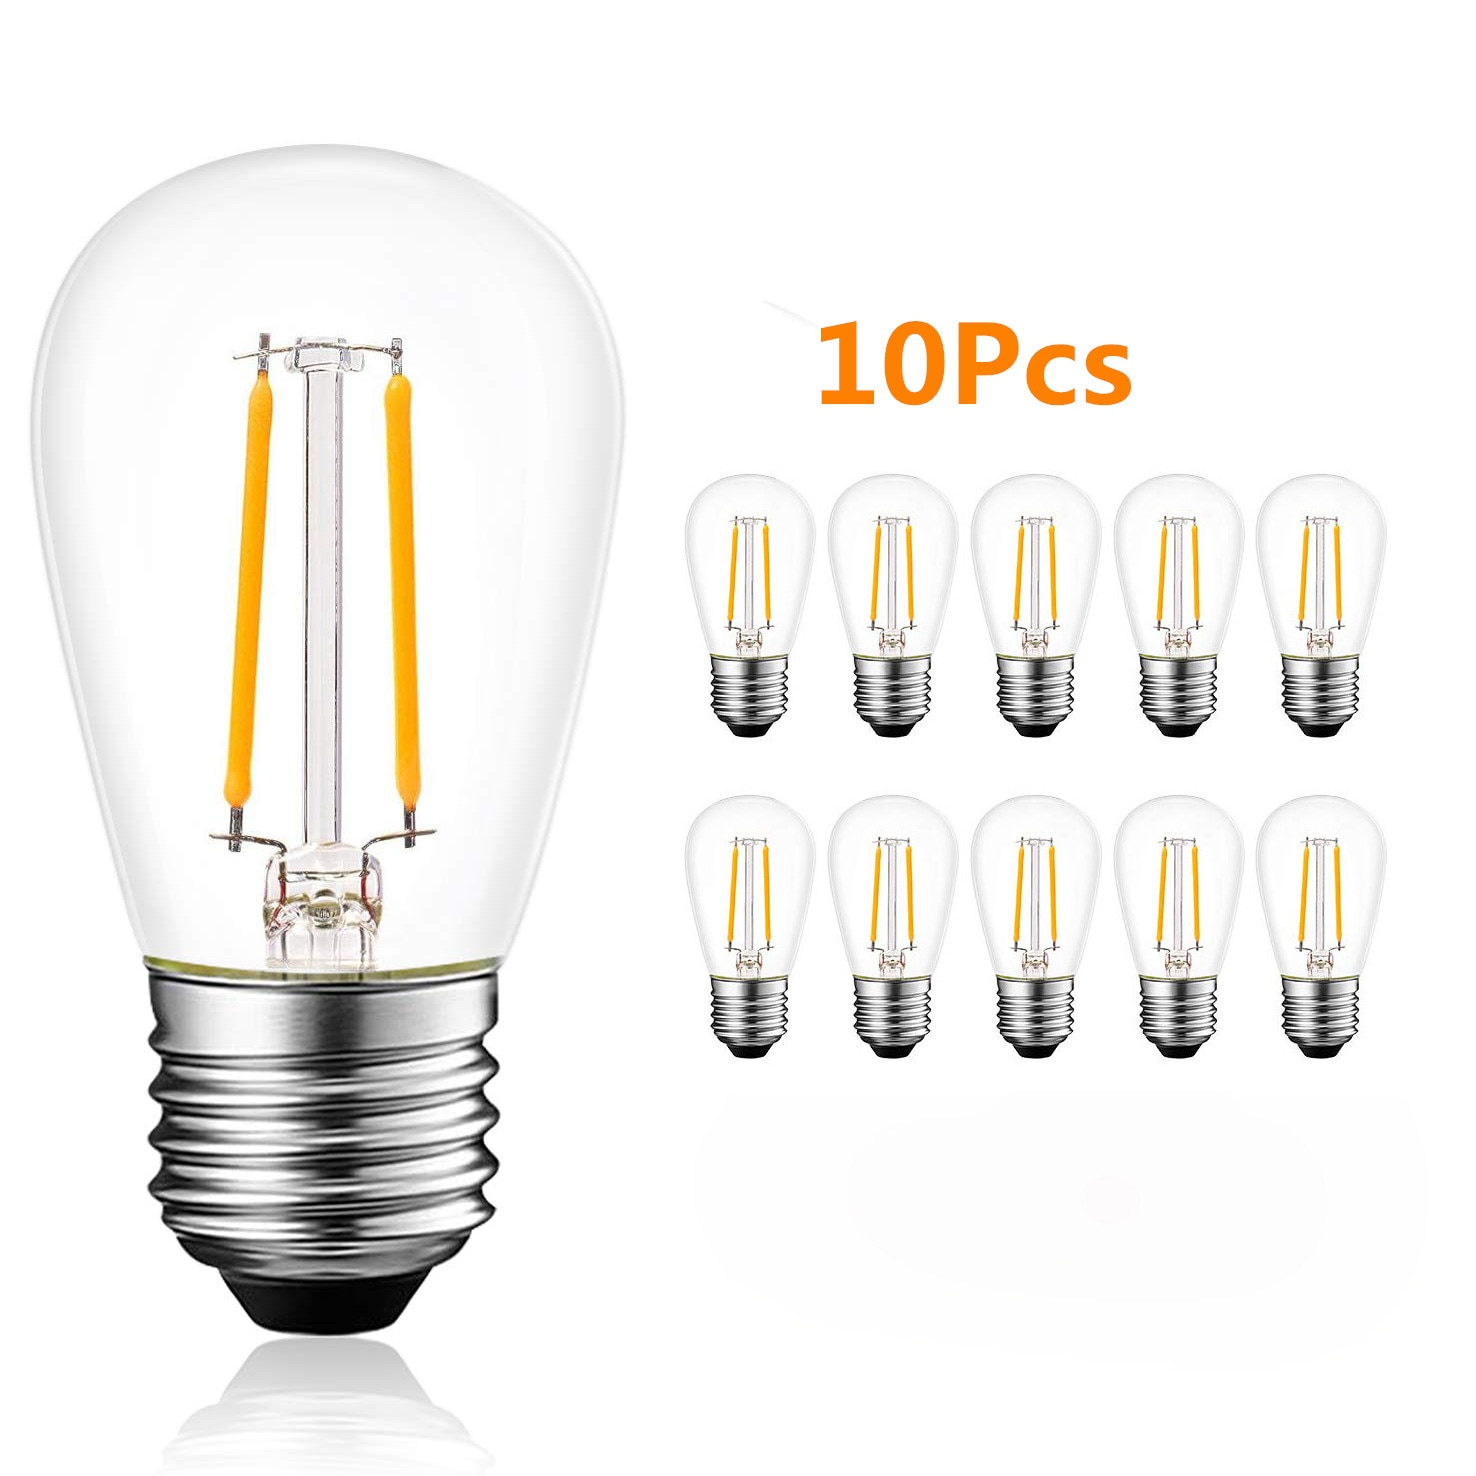 10 Uds S14 E27 2W 4W bombillas LED de luz de Edison blanco cálido 2700K bombilla LED impermeable grandes luces de cuerda de grado comercial al aire libre